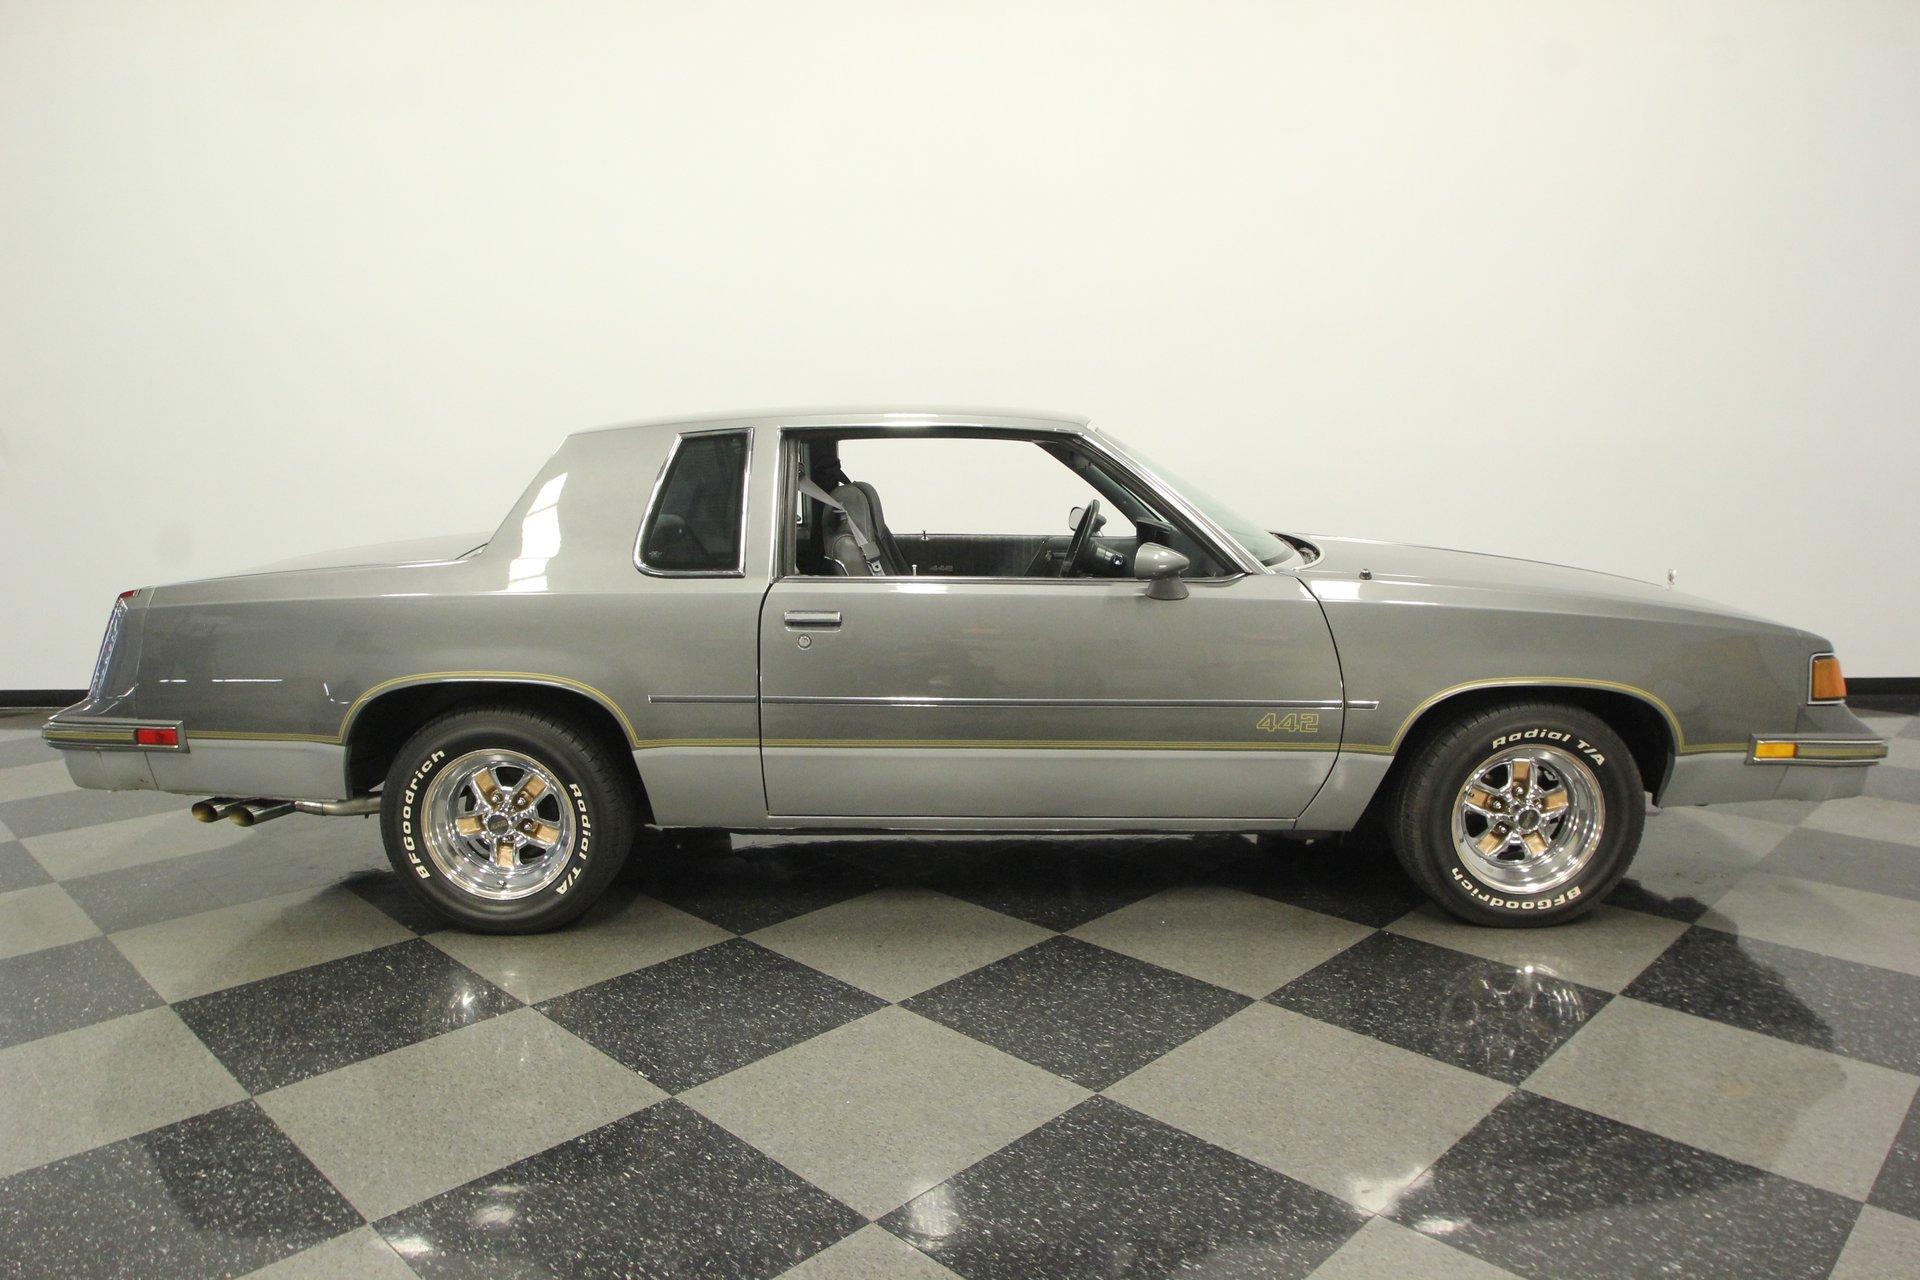 1987 Oldsmobile Cutlass | Streetside Classics - The Nation's Trusted